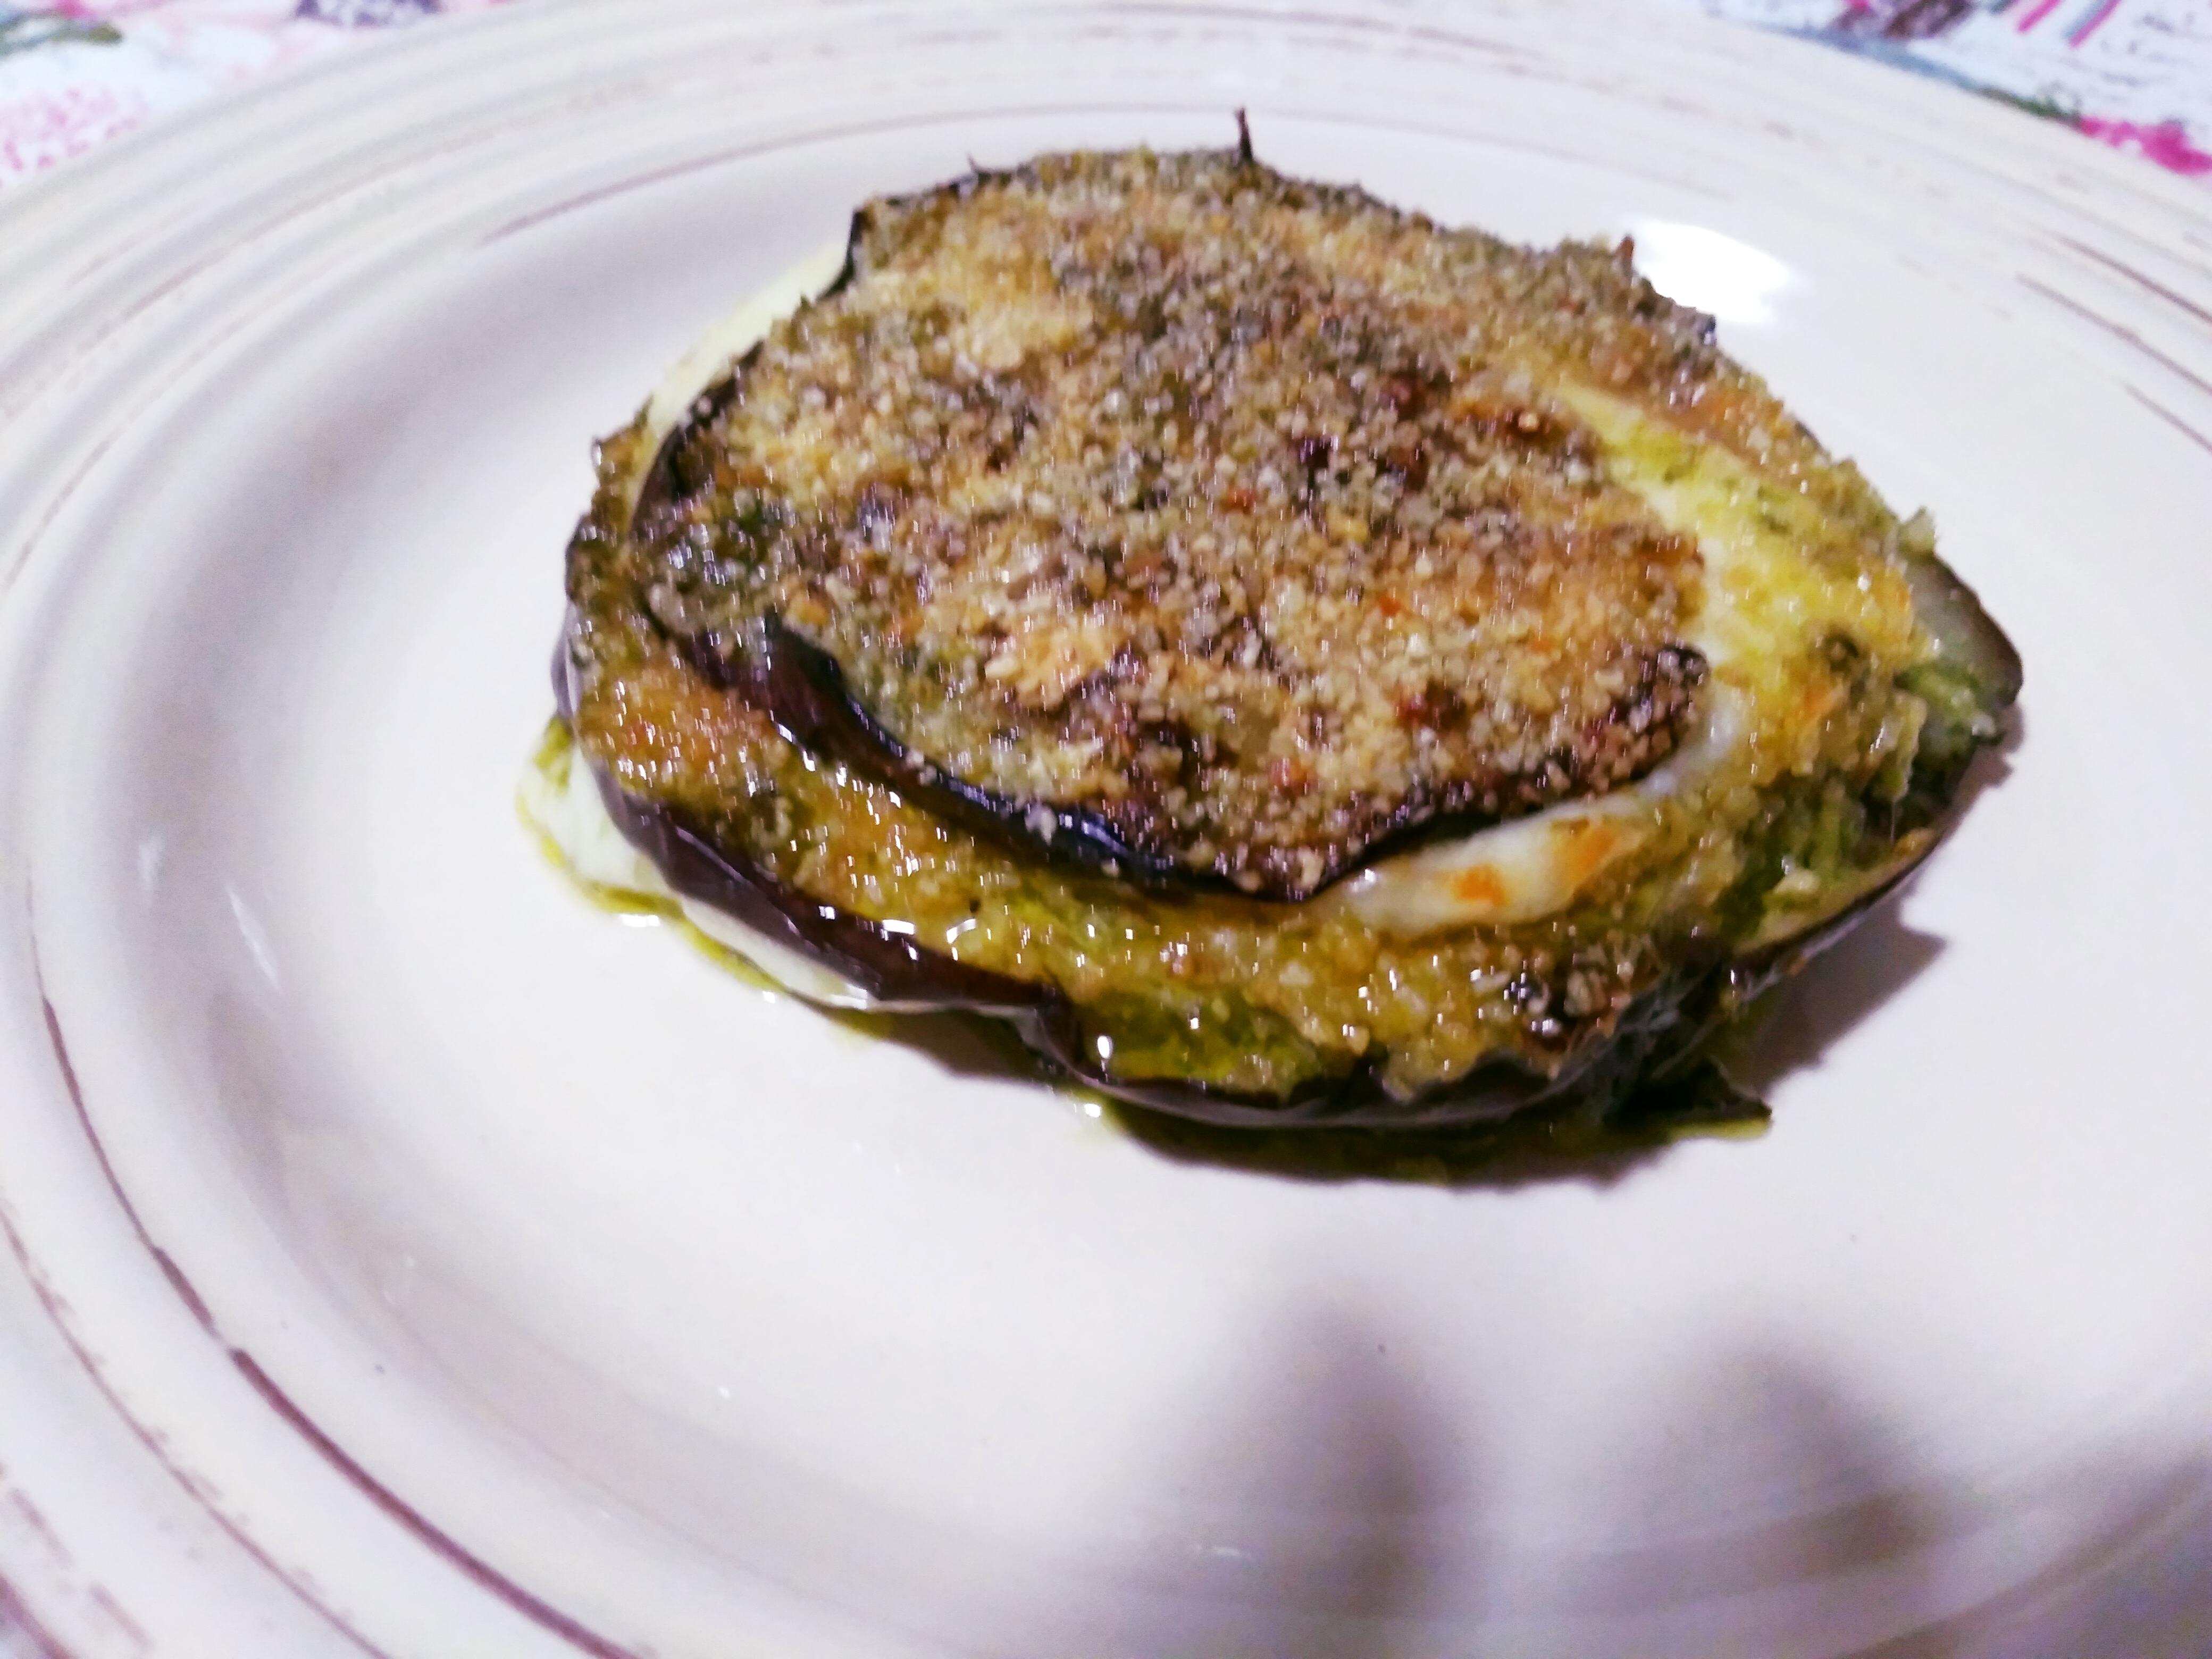 Parmigiana di melanzane bianca con pesto e mozzarella